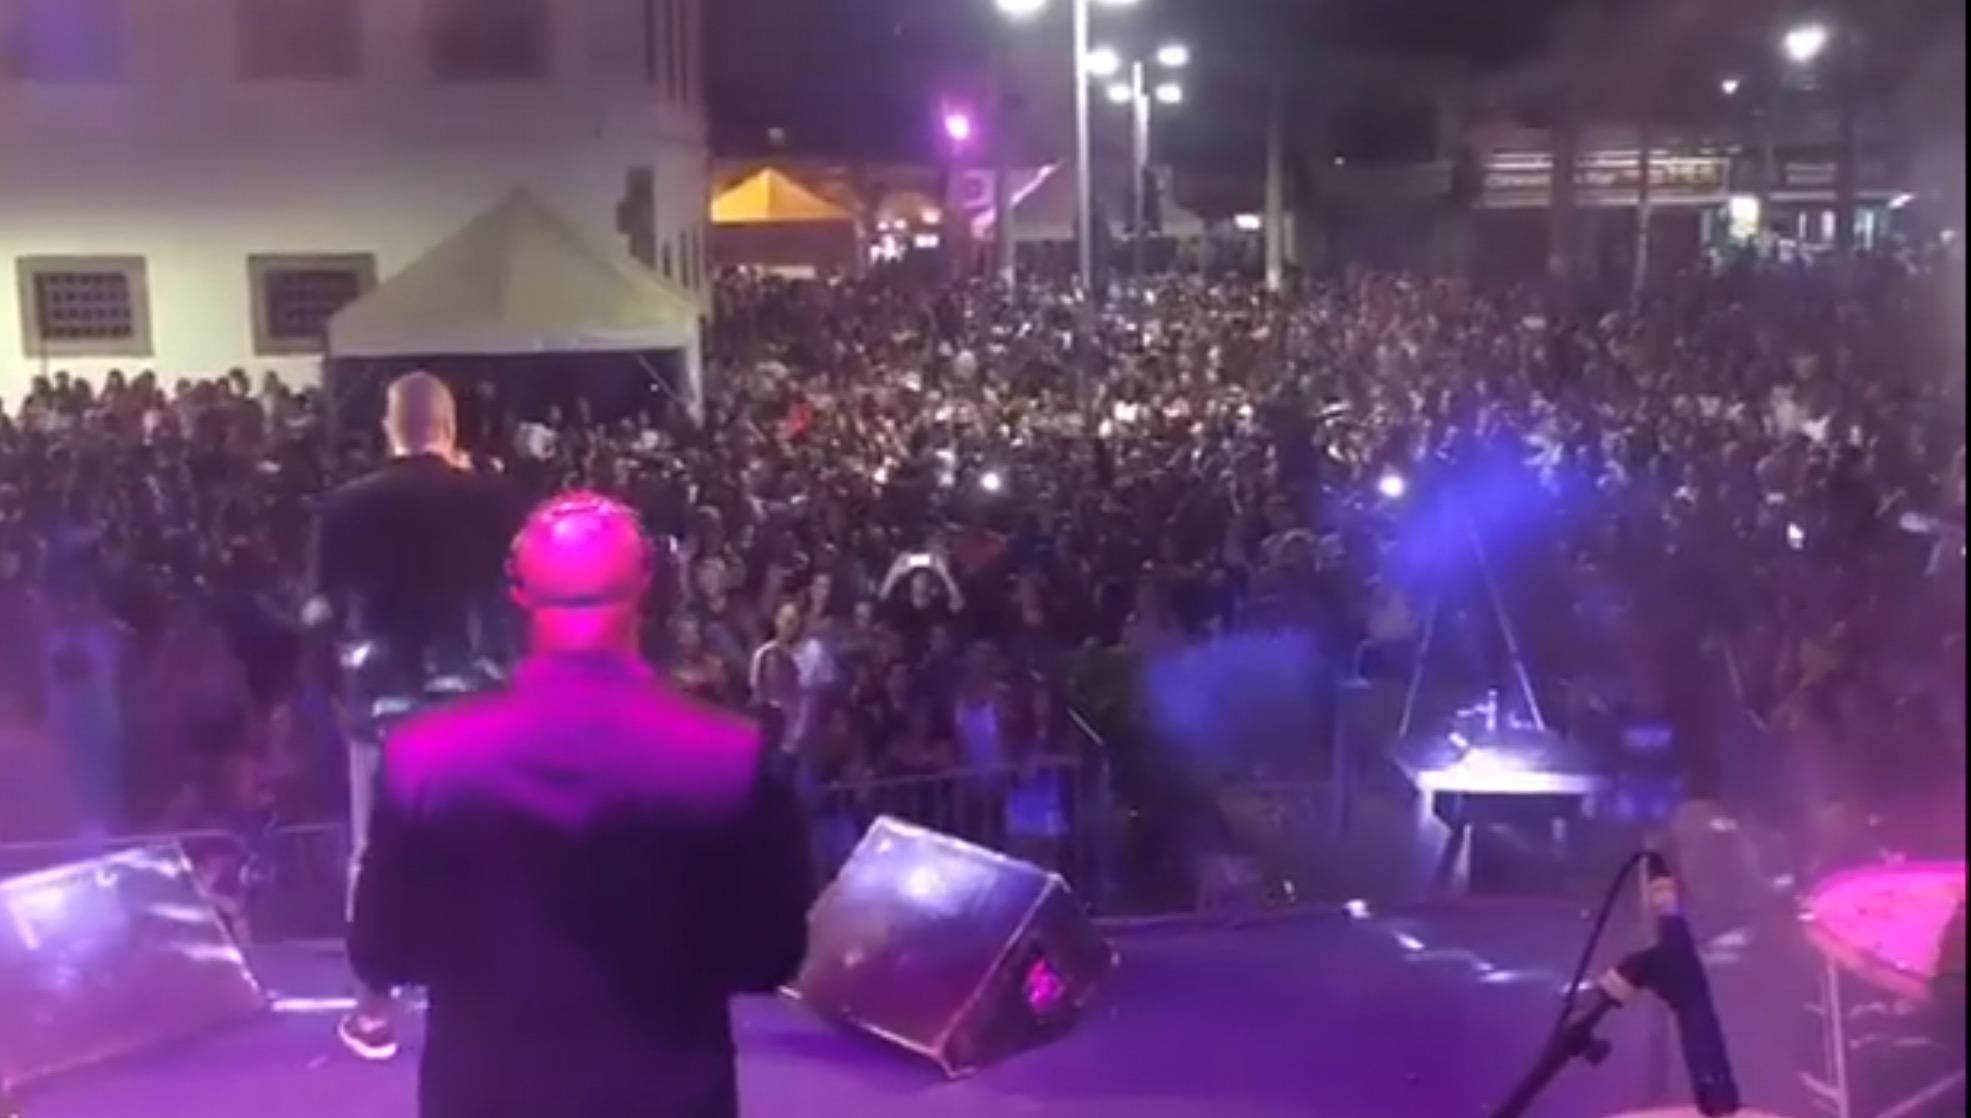 Maricá: Insegurança e atraso marcam baile municipal de Carnaval